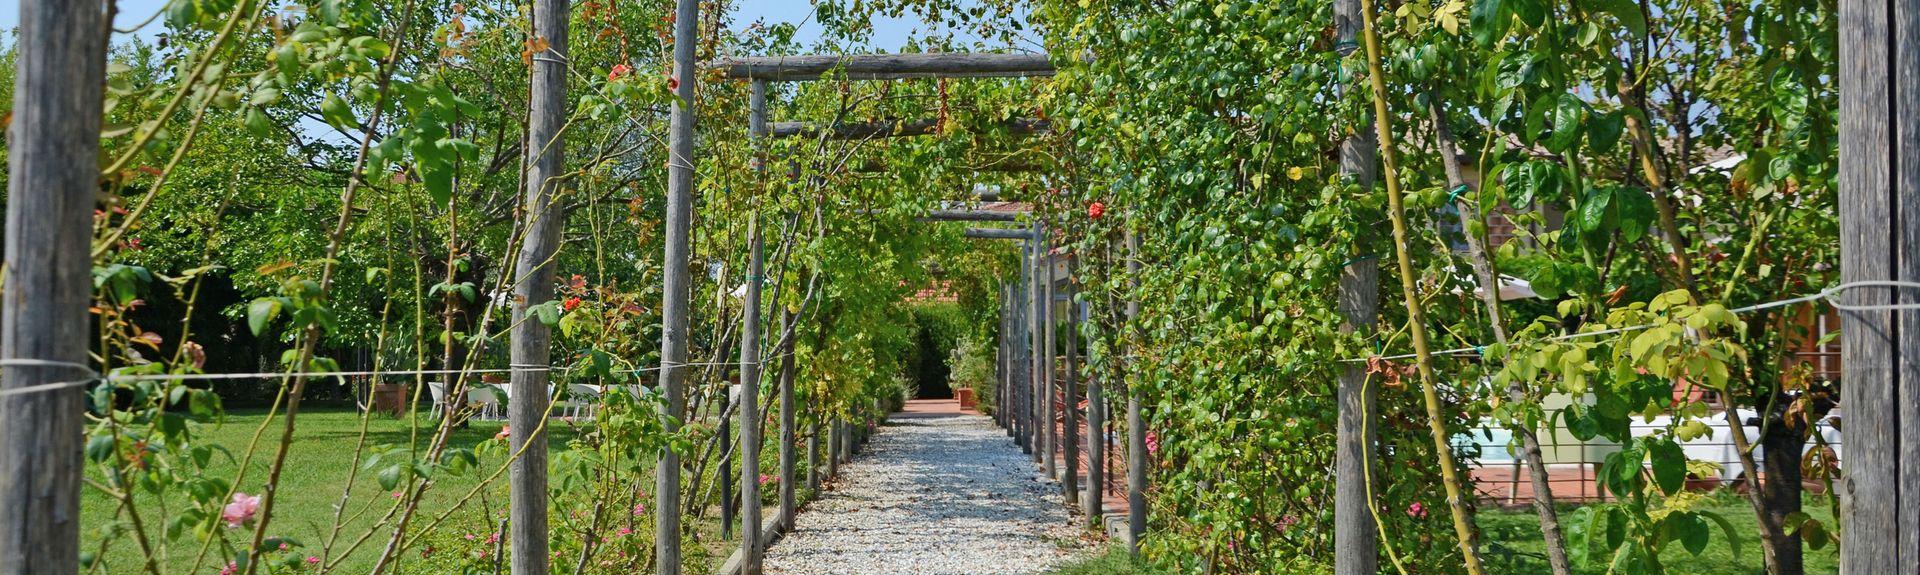 Lido di Camaiore, Toscana, Italia